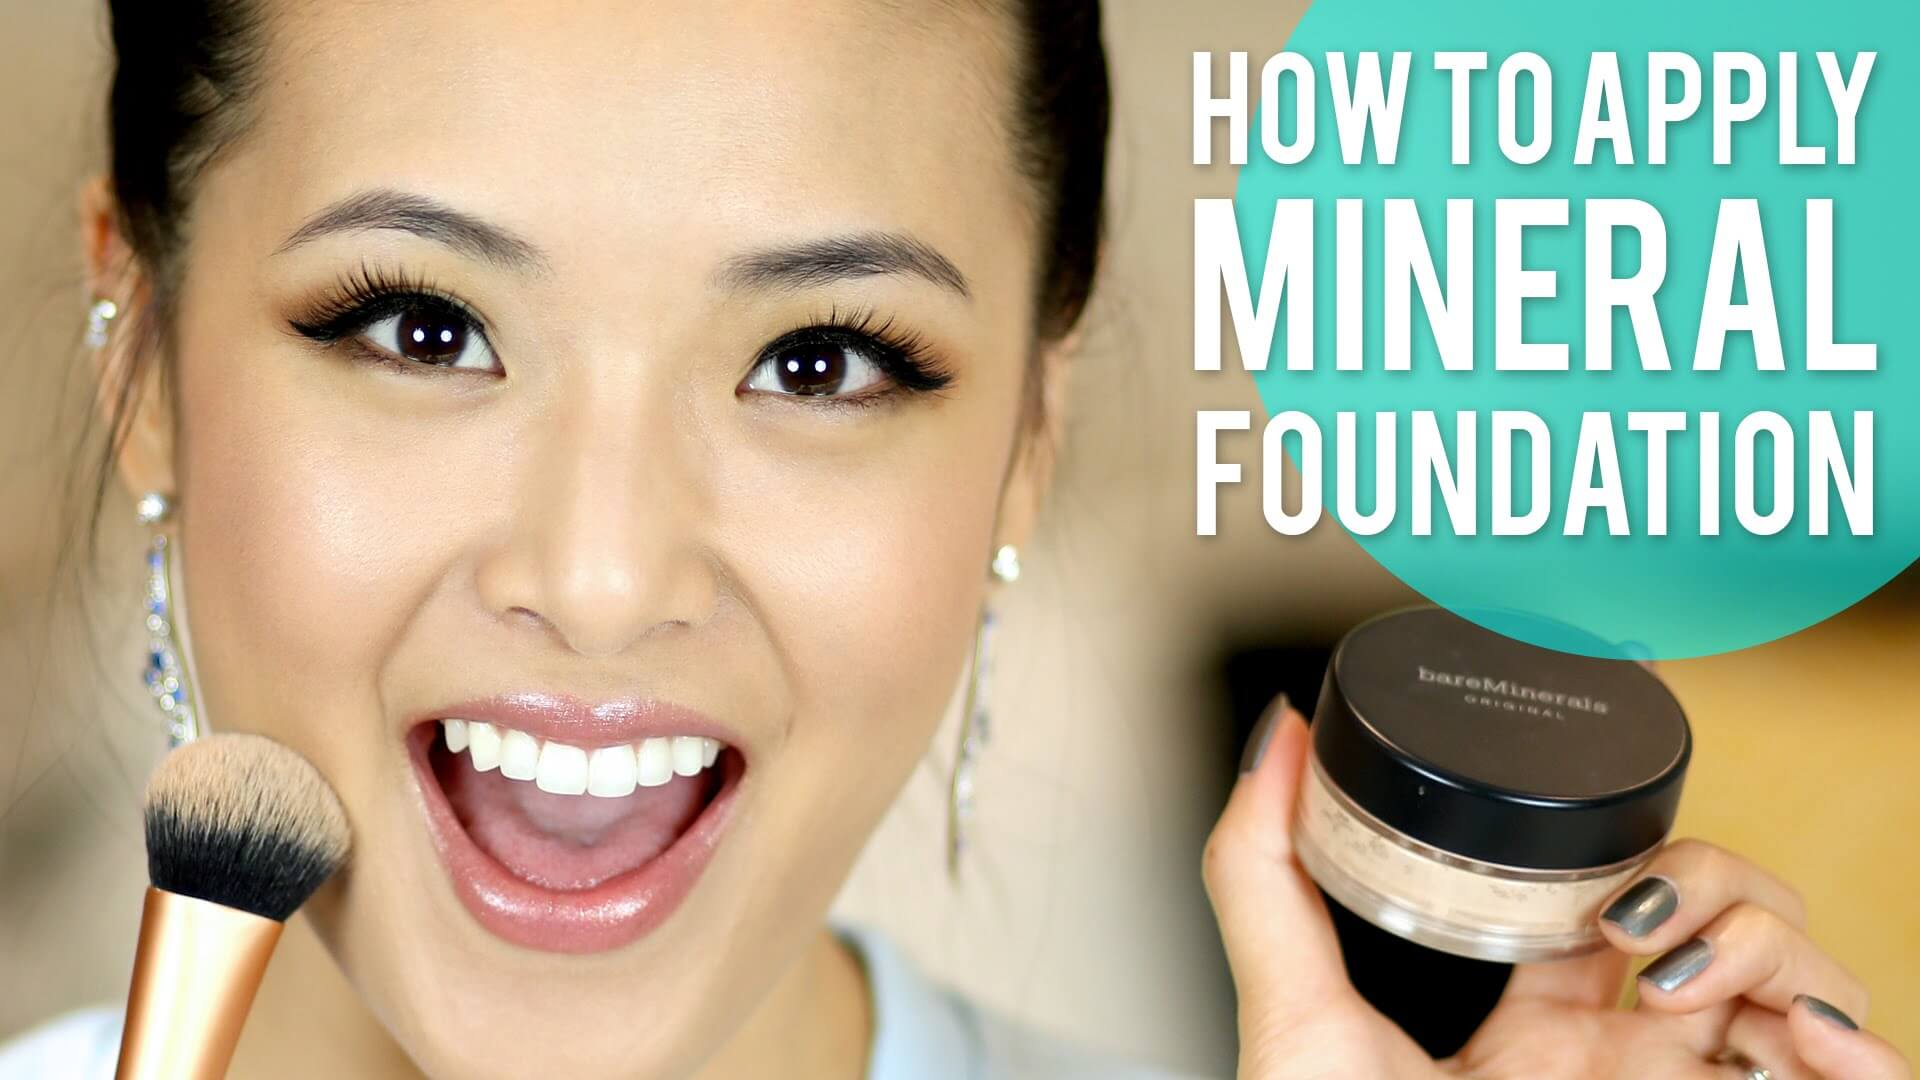 Mineral makeup coupons